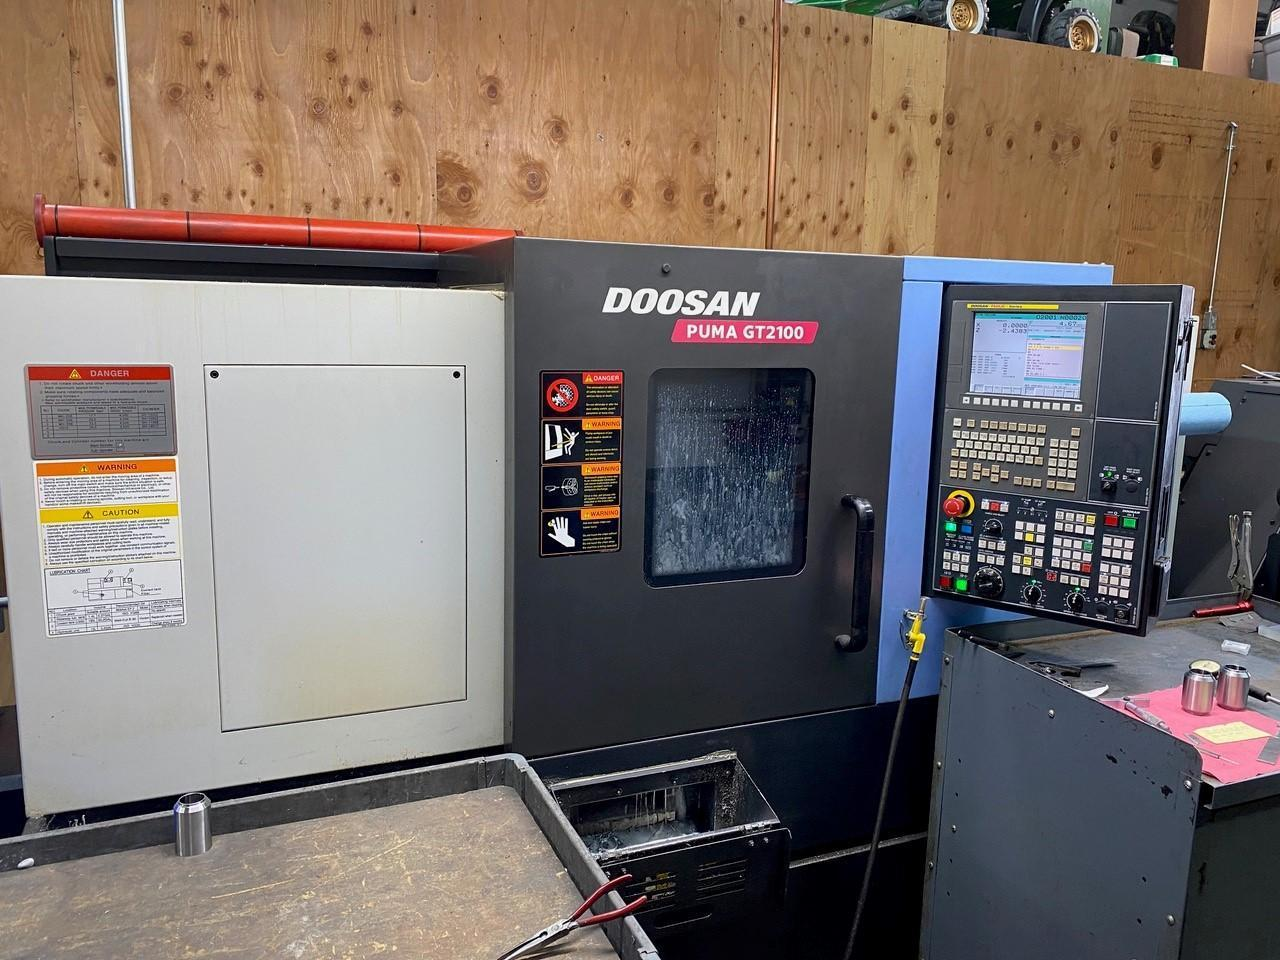 Doosan Puma GT-2100 HTC 2014, Fanuc i Series CNC Control, Tailstock, Tool Presetter, Parts Catcher, Barfeed Interface, and LNS Turbo HB Chip Conveyor.